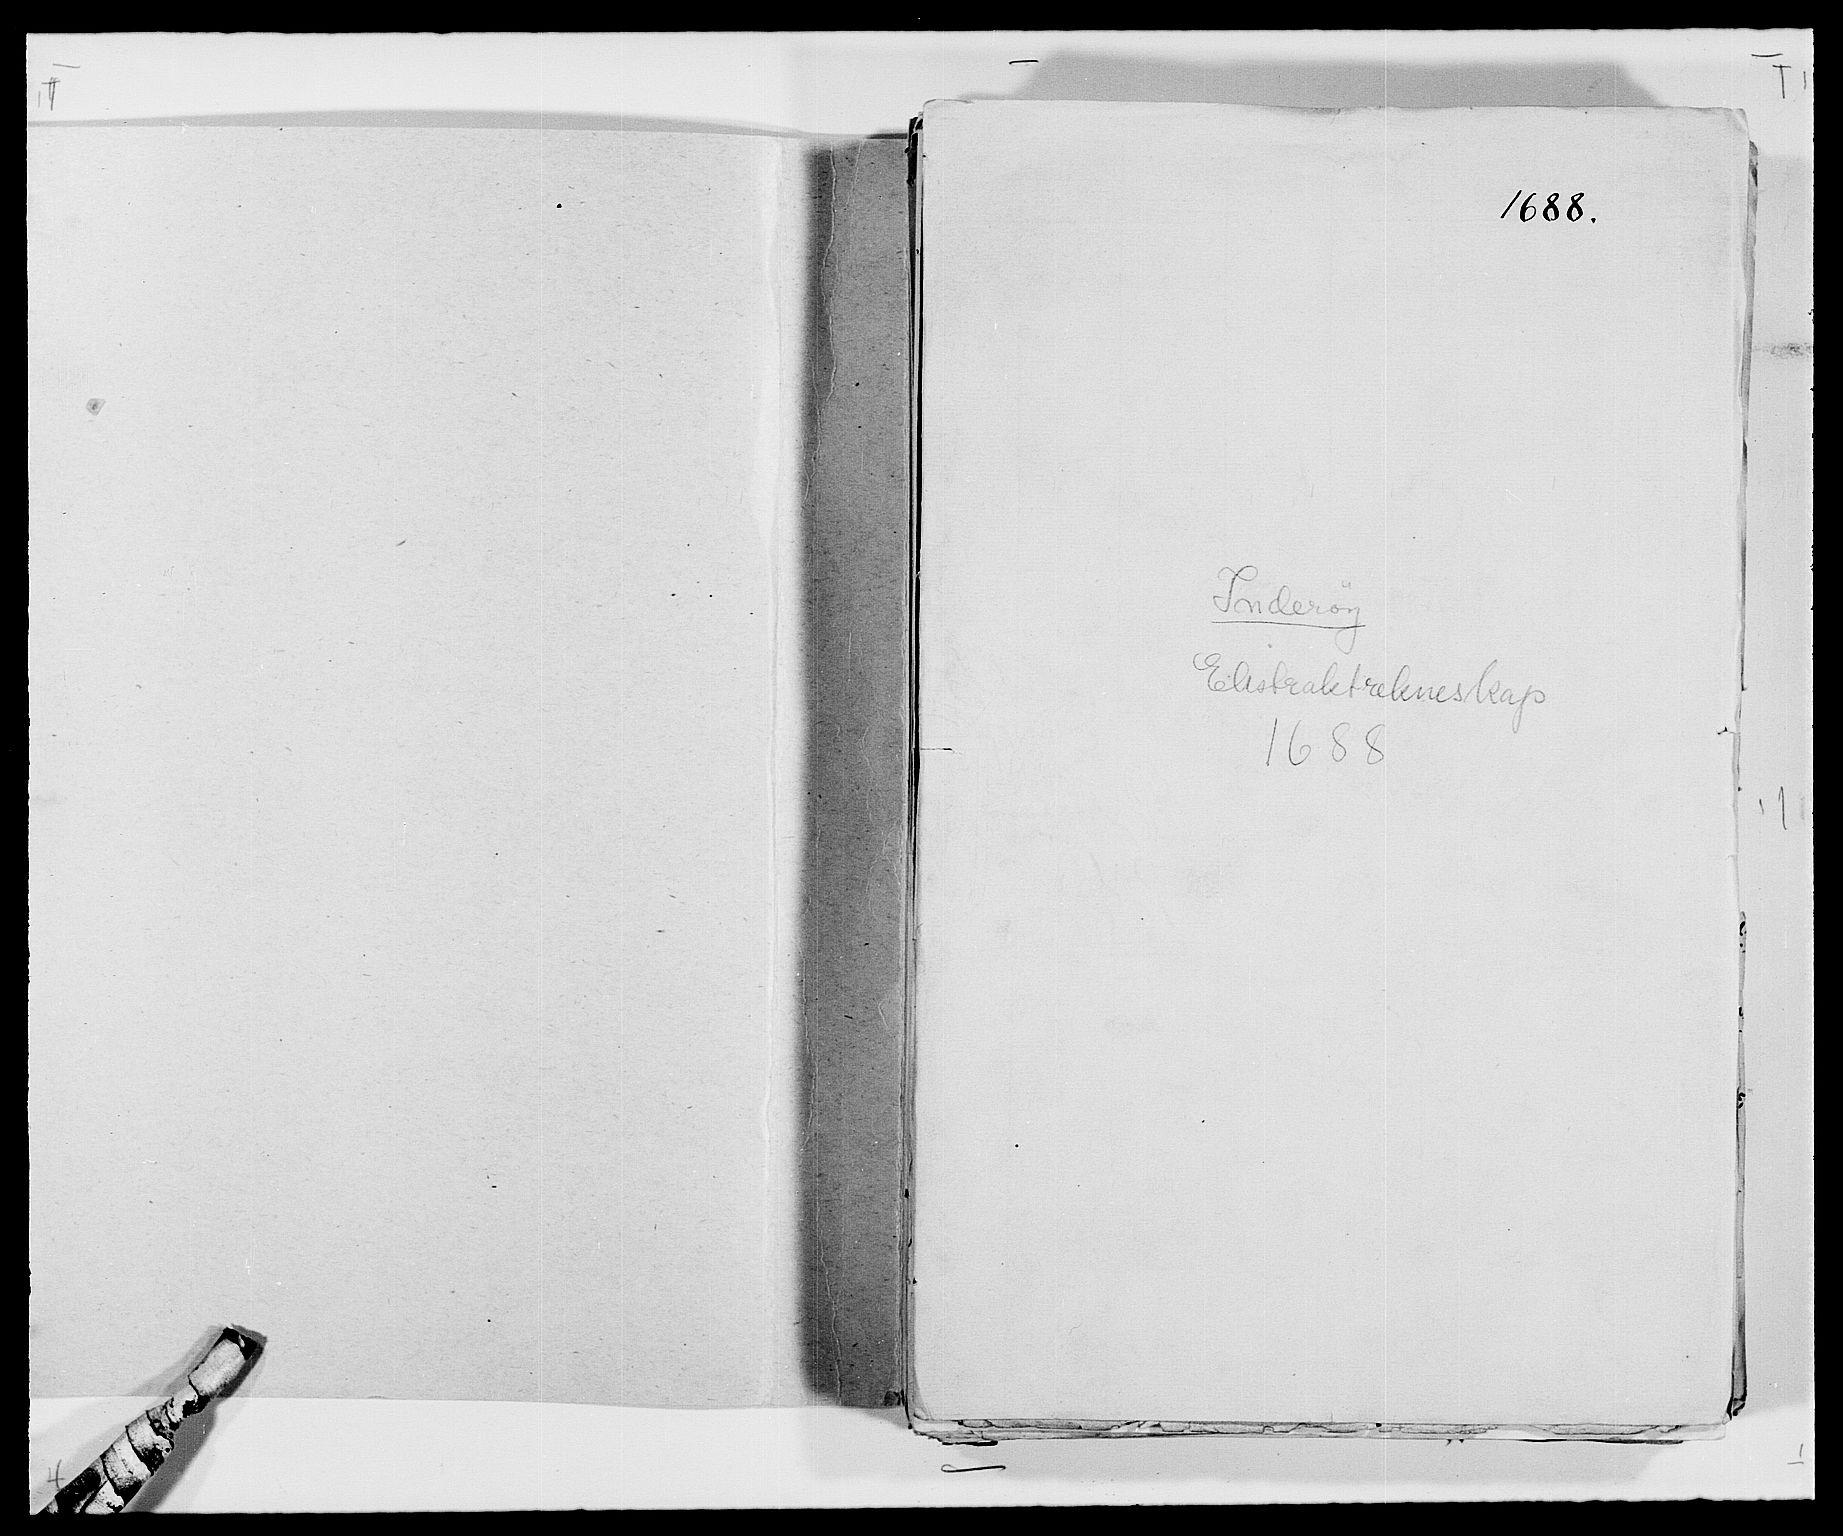 RA, Rentekammeret inntil 1814, Reviderte regnskaper, Fogderegnskap, R63/L4306: Fogderegnskap Inderøy, 1687-1689, s. 232